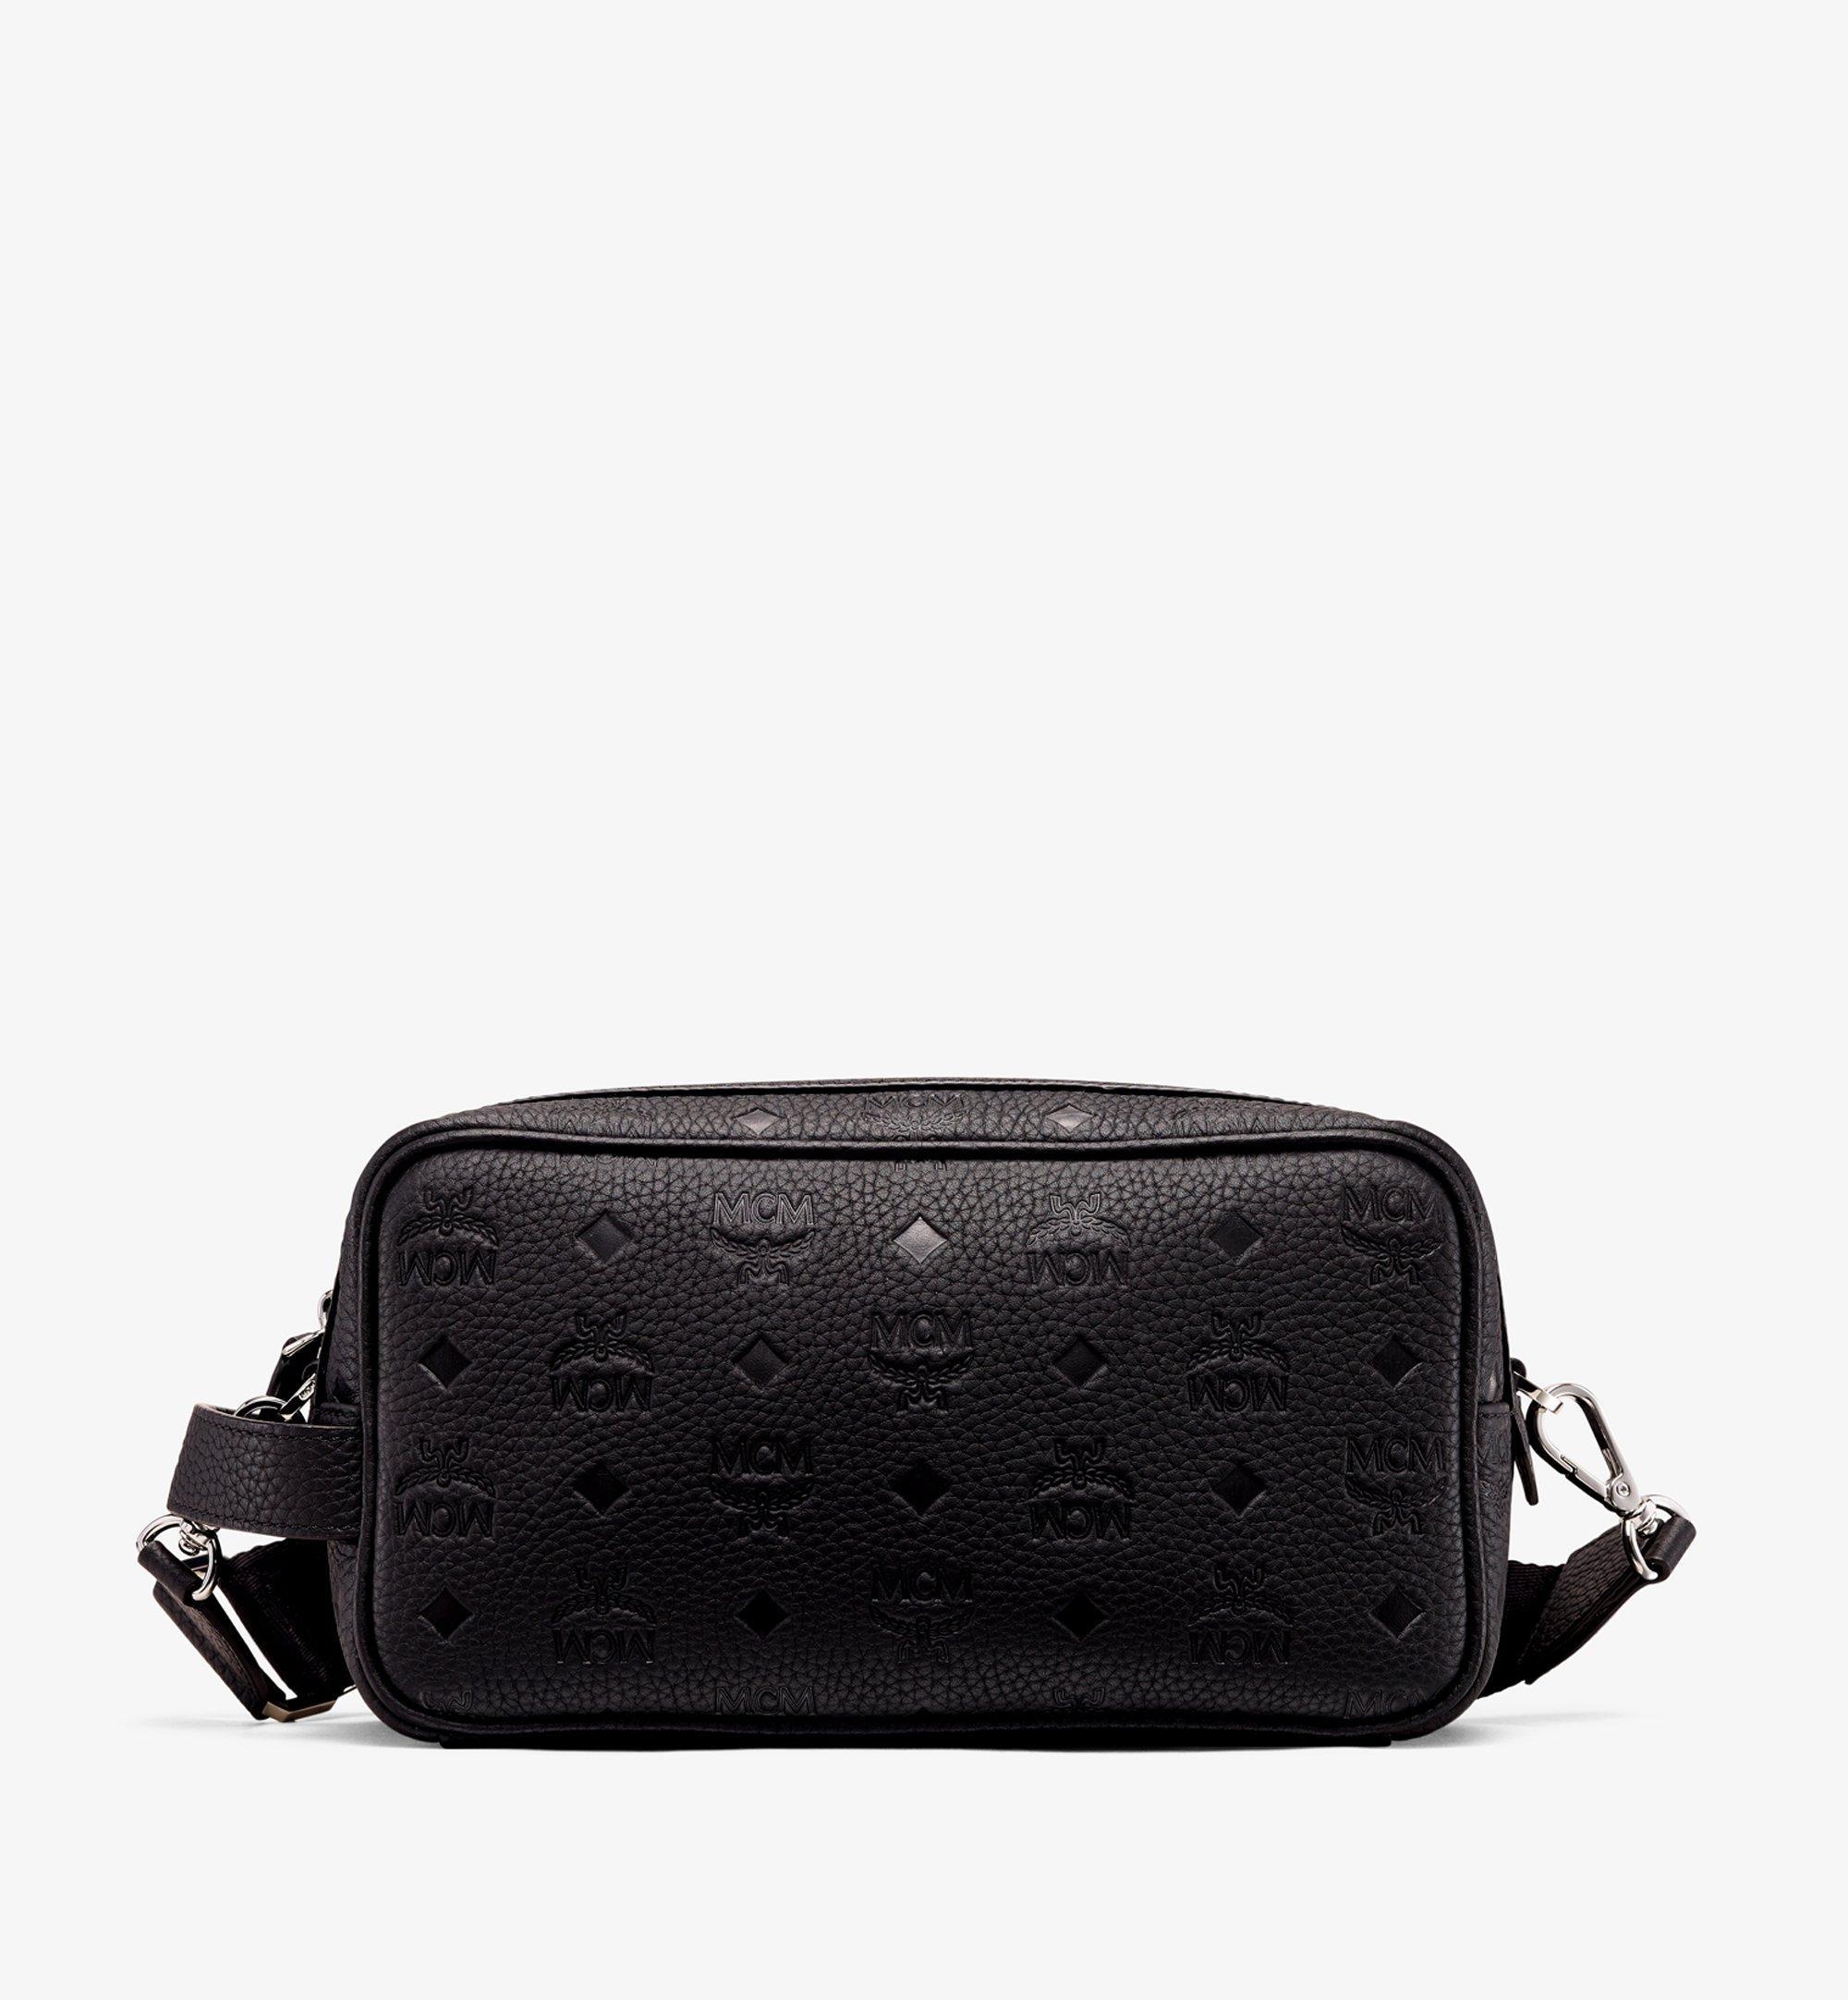 MCM Tivitat Wash Bag in Monogram Leather Black MXZ9ABT28BK001 Alternate View 1